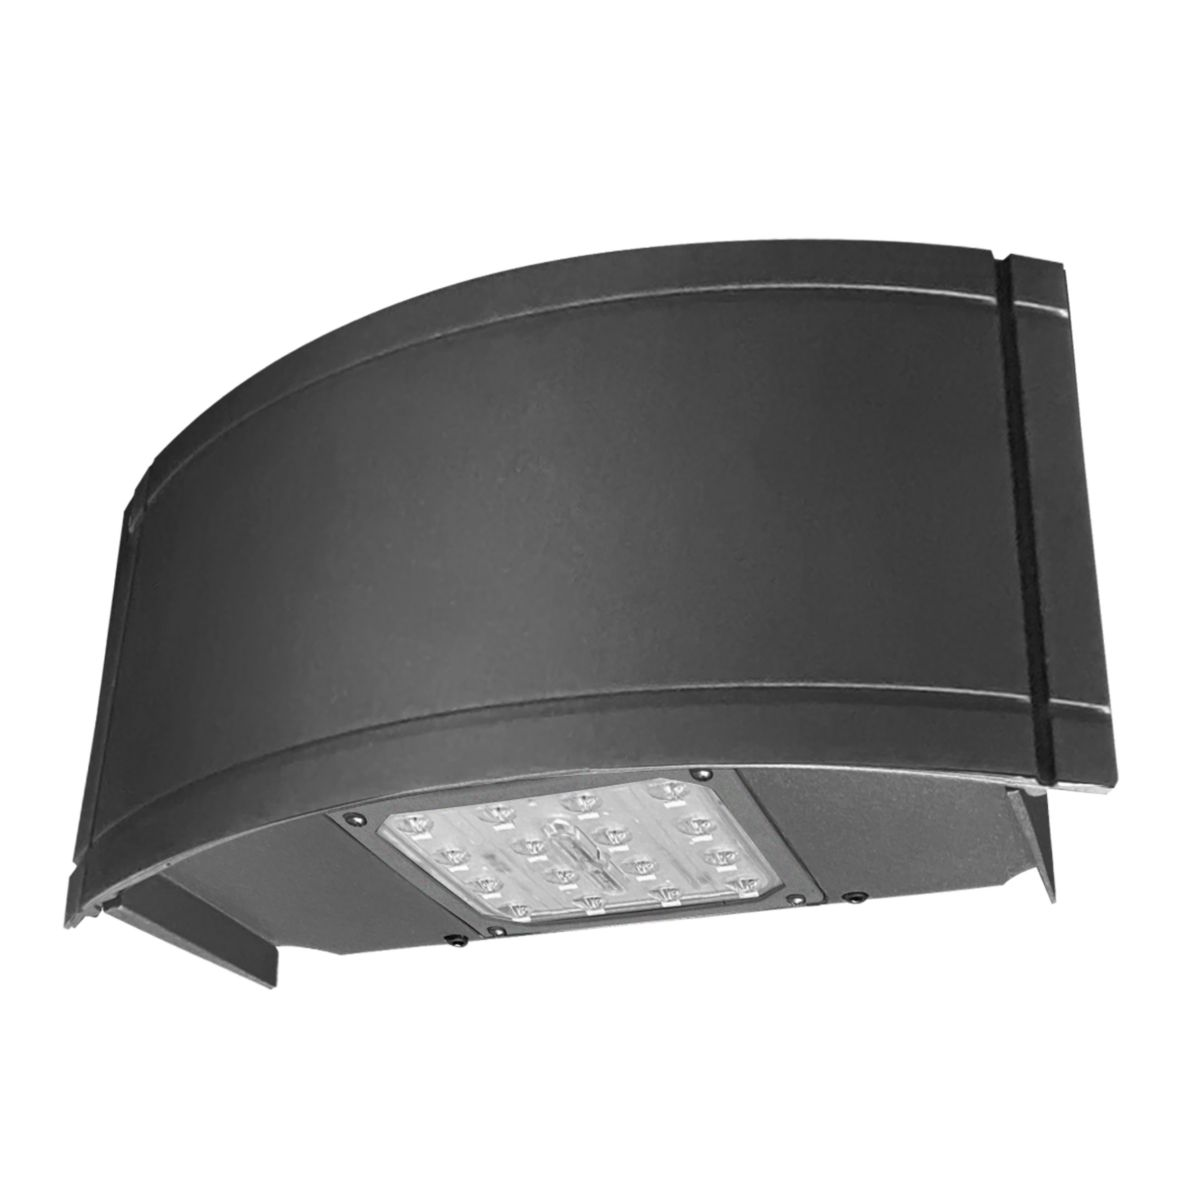 ENV Entri Round Reveals LED